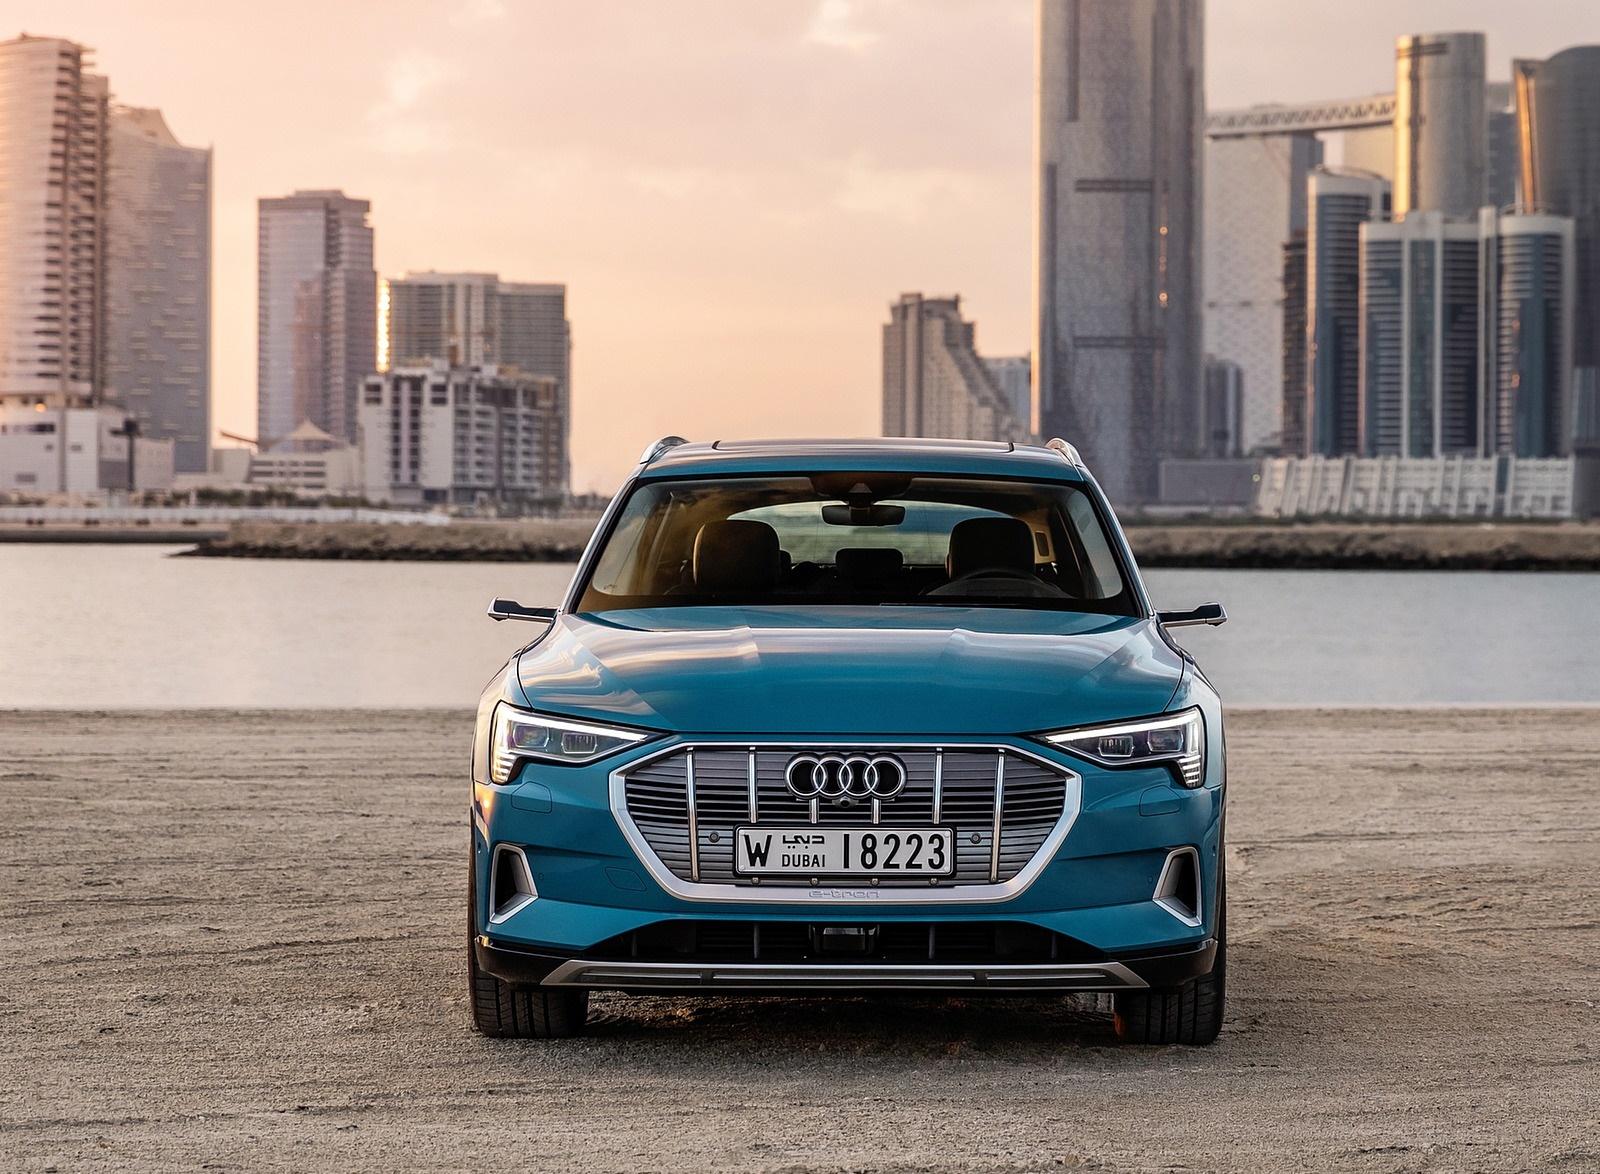 Audi E Tron Antigua Blue Audi Cars Review Release Raiacarscom